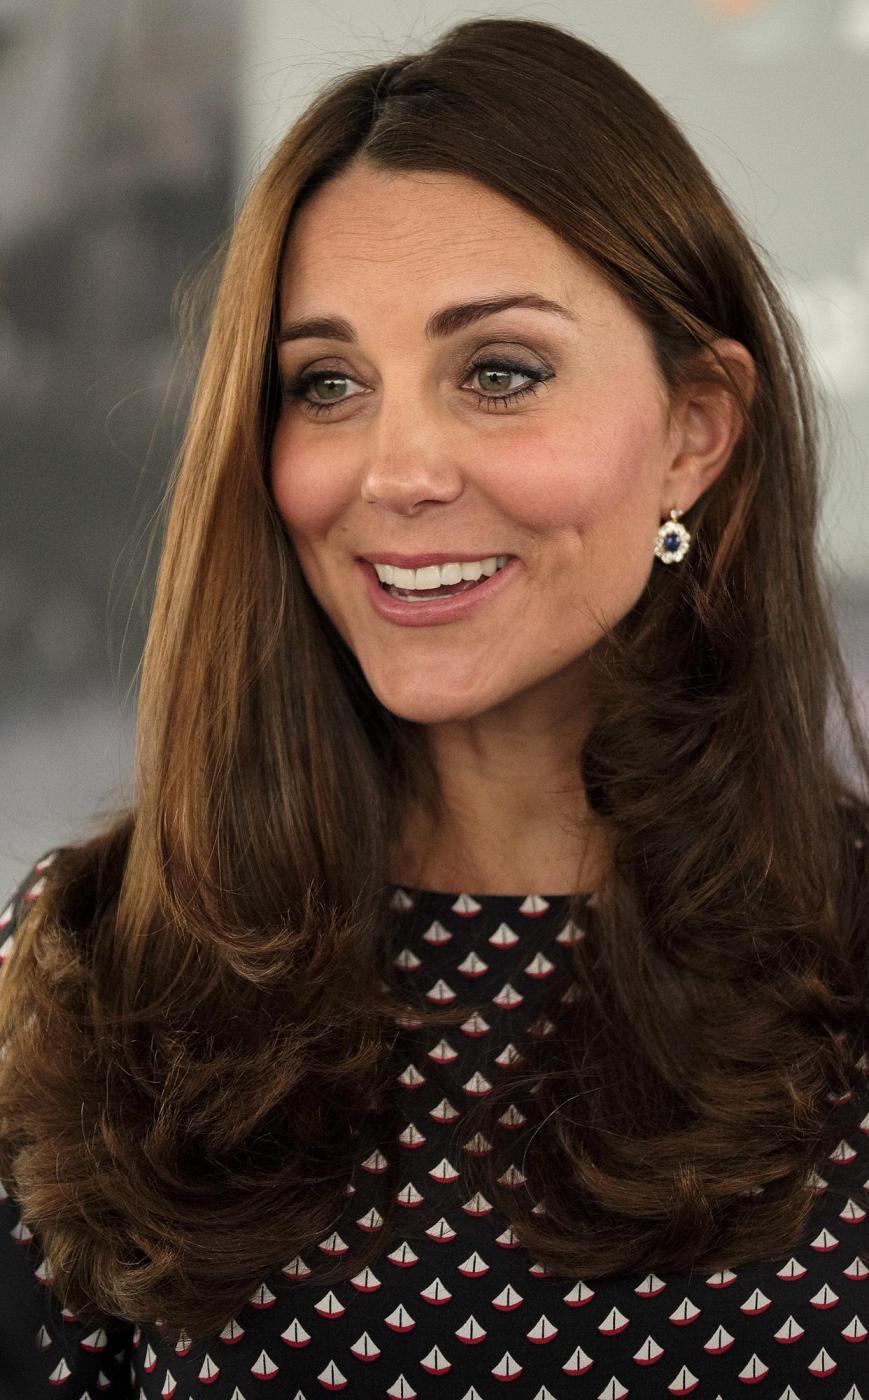 Kate Middleton torna dai Caraibi abbronzata e con un bel pancione 22